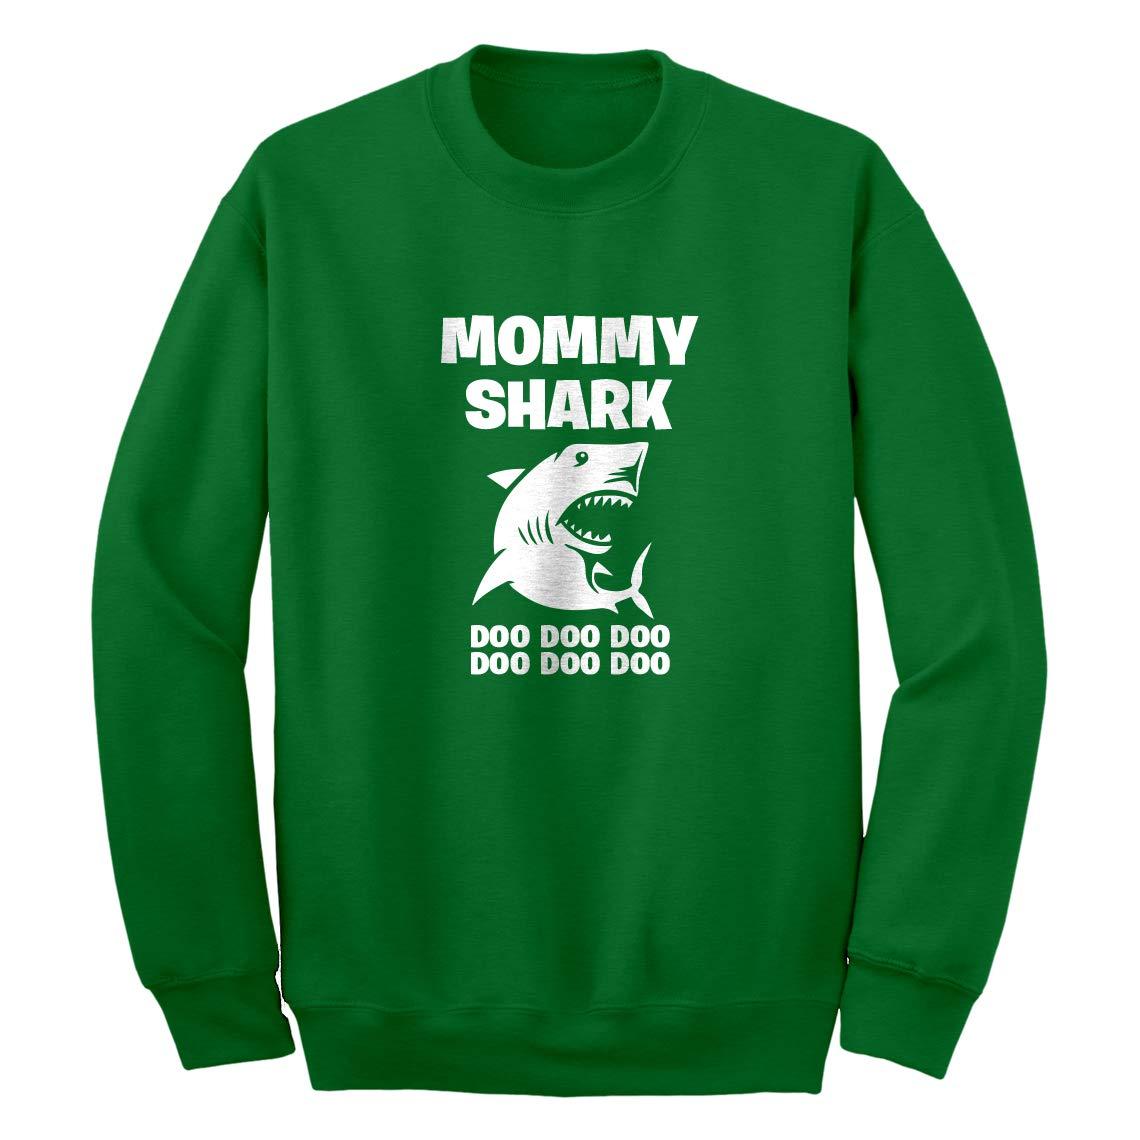 Indica Plateau Mommy Shark Unisex Adult Sweatshirt 3756-C